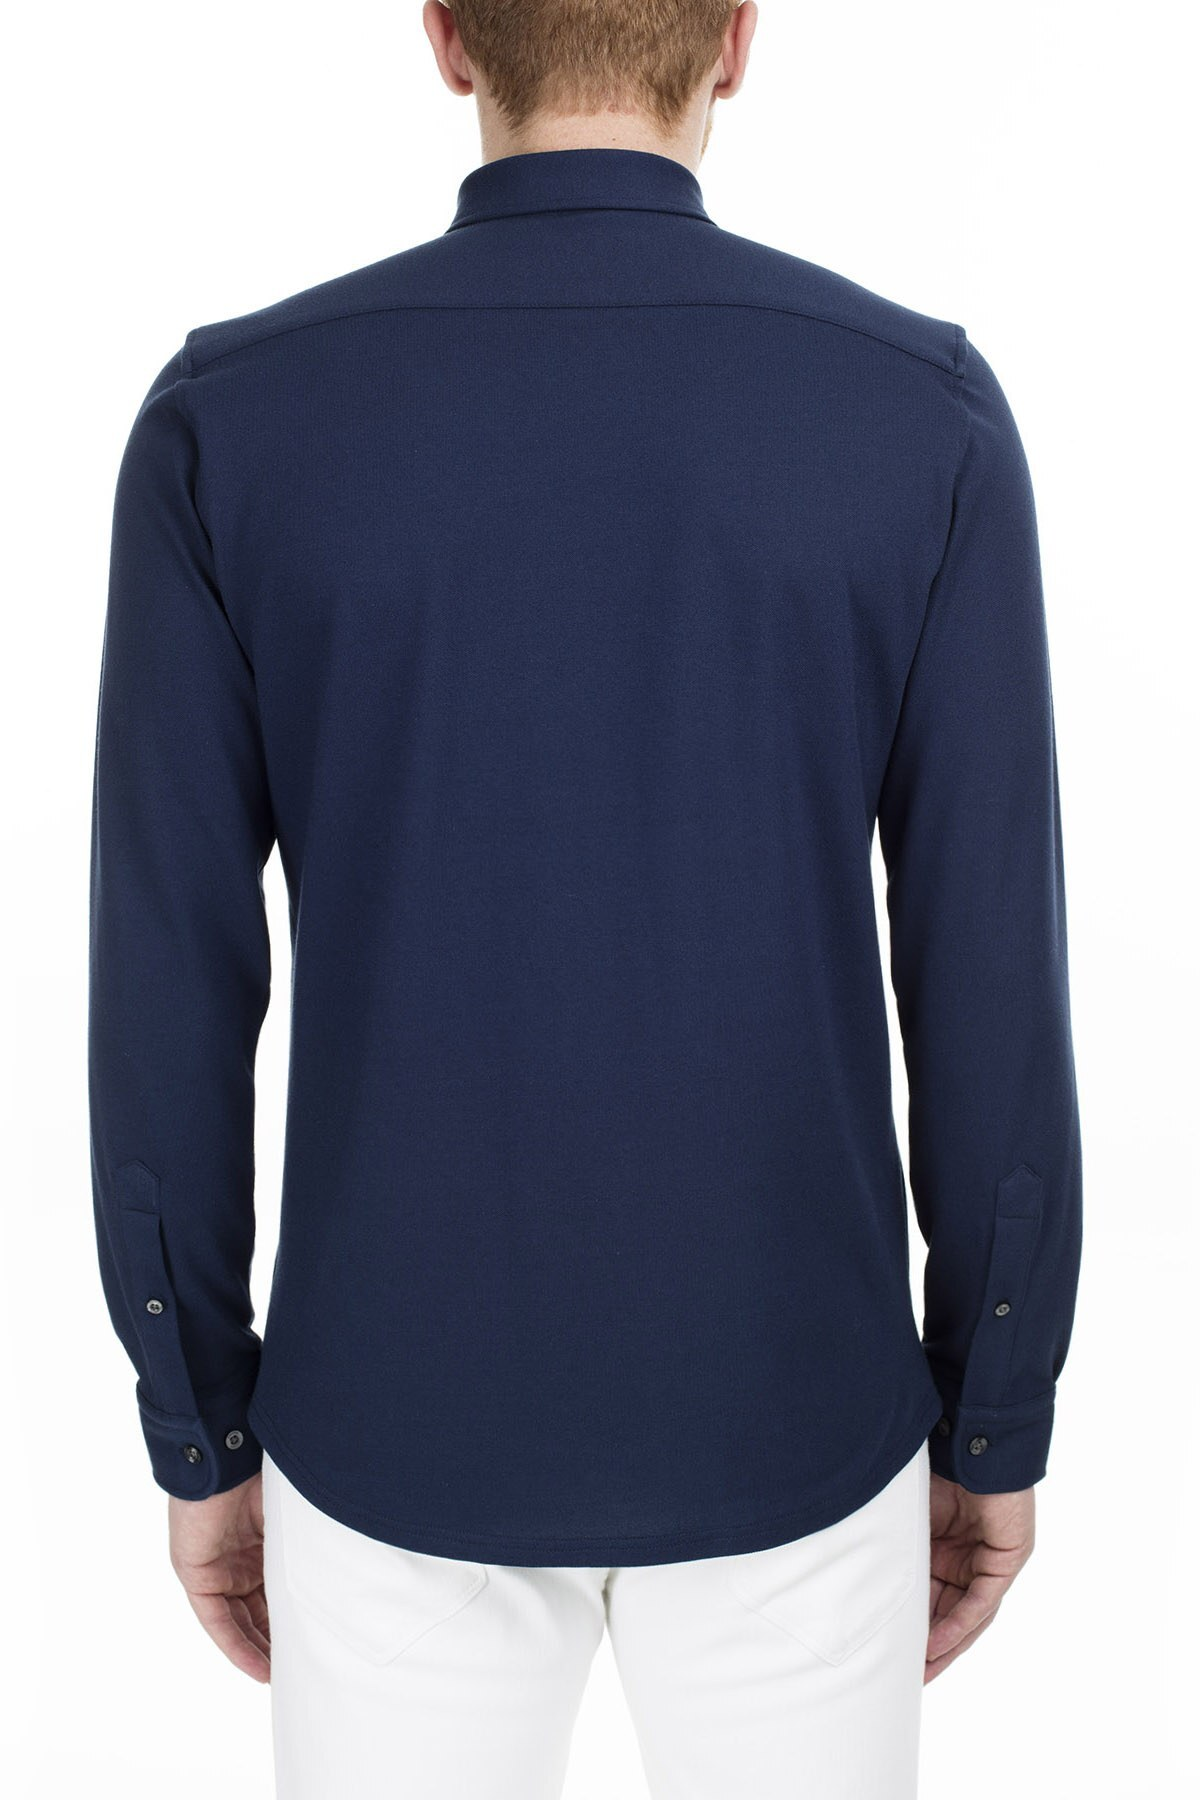 Lacoste Slim Fit Erkek Gömlek CH0953 53L LACİVERT